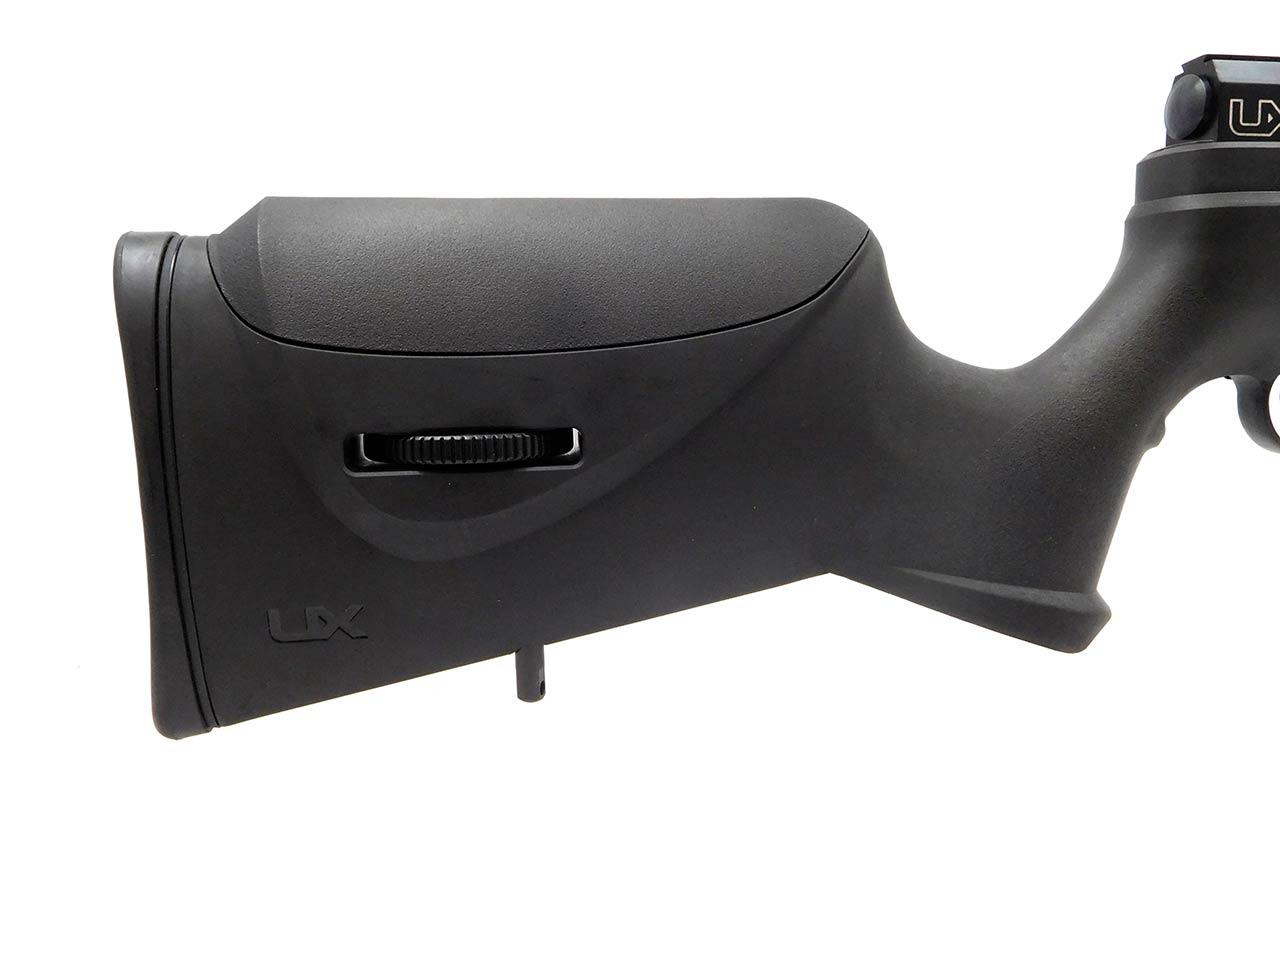 Umarex Gauntlet PCP Pellet Rifle